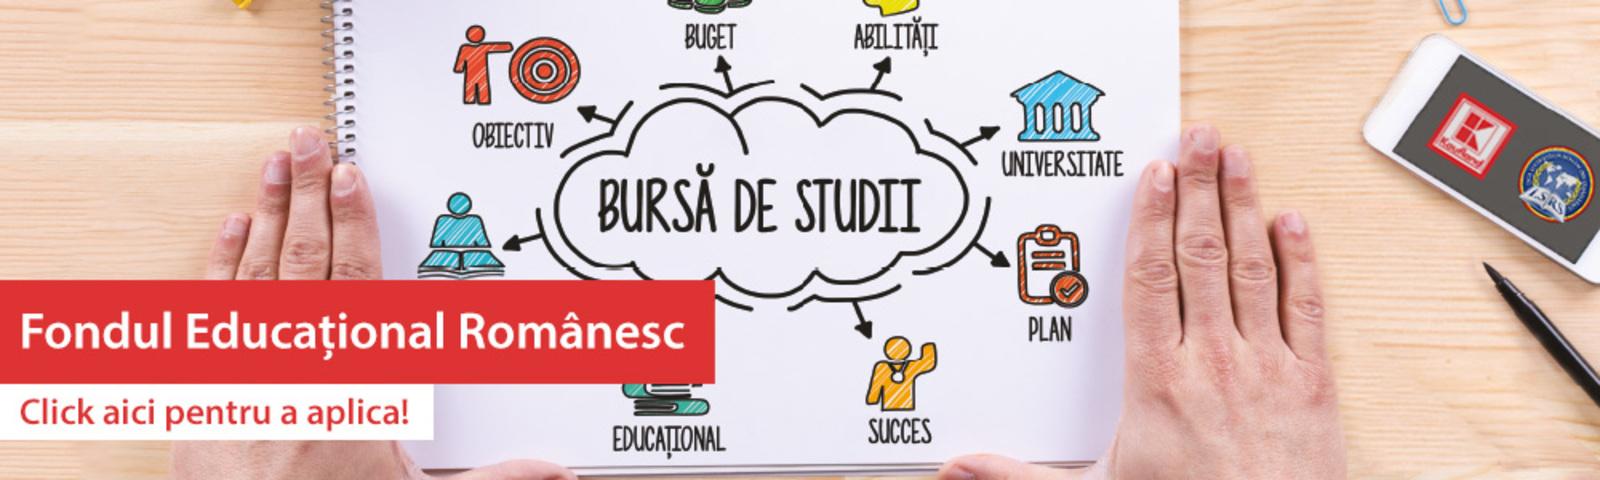 LSRS_Kaufland_Fondul_Educational_Romanesc_Burse_Studii